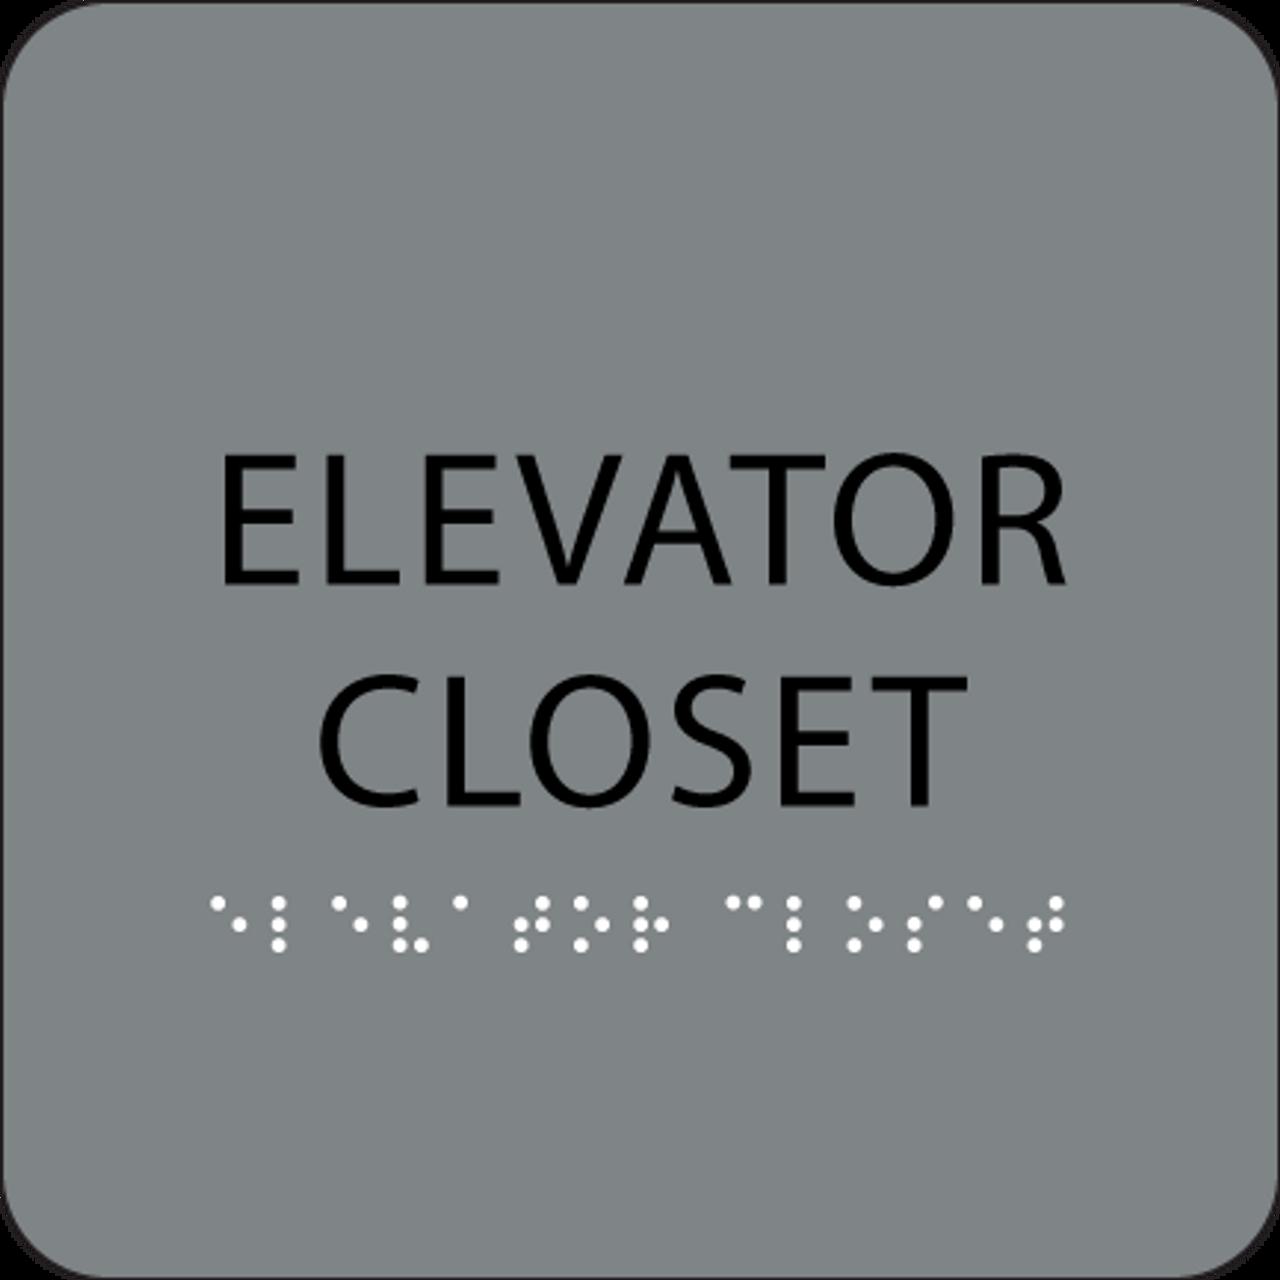 Grey ADA Elevator Closet Sign